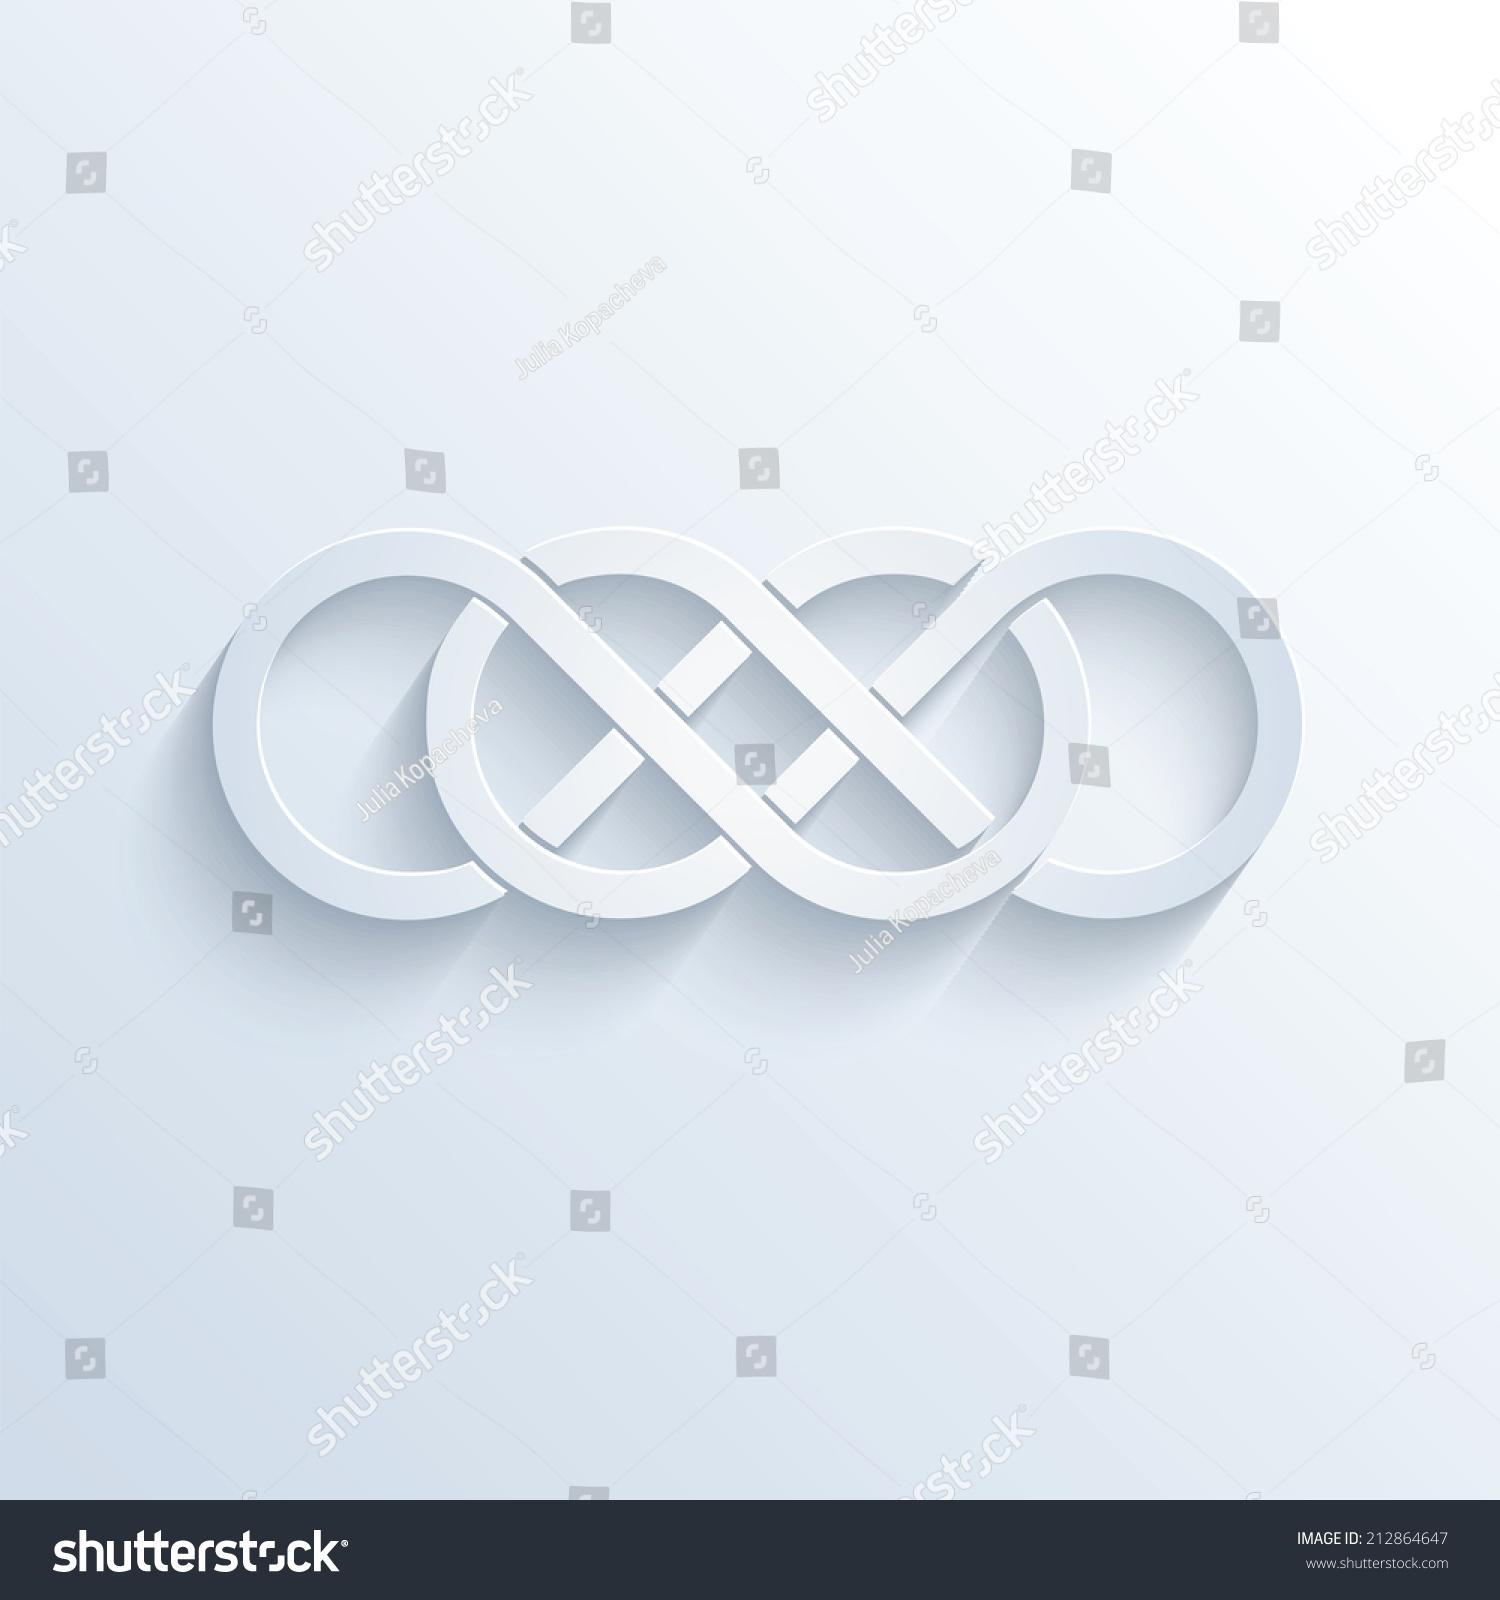 Vector illustration double infinity sign shadow stock vector vector illustration of double infinity sign with shadow buycottarizona